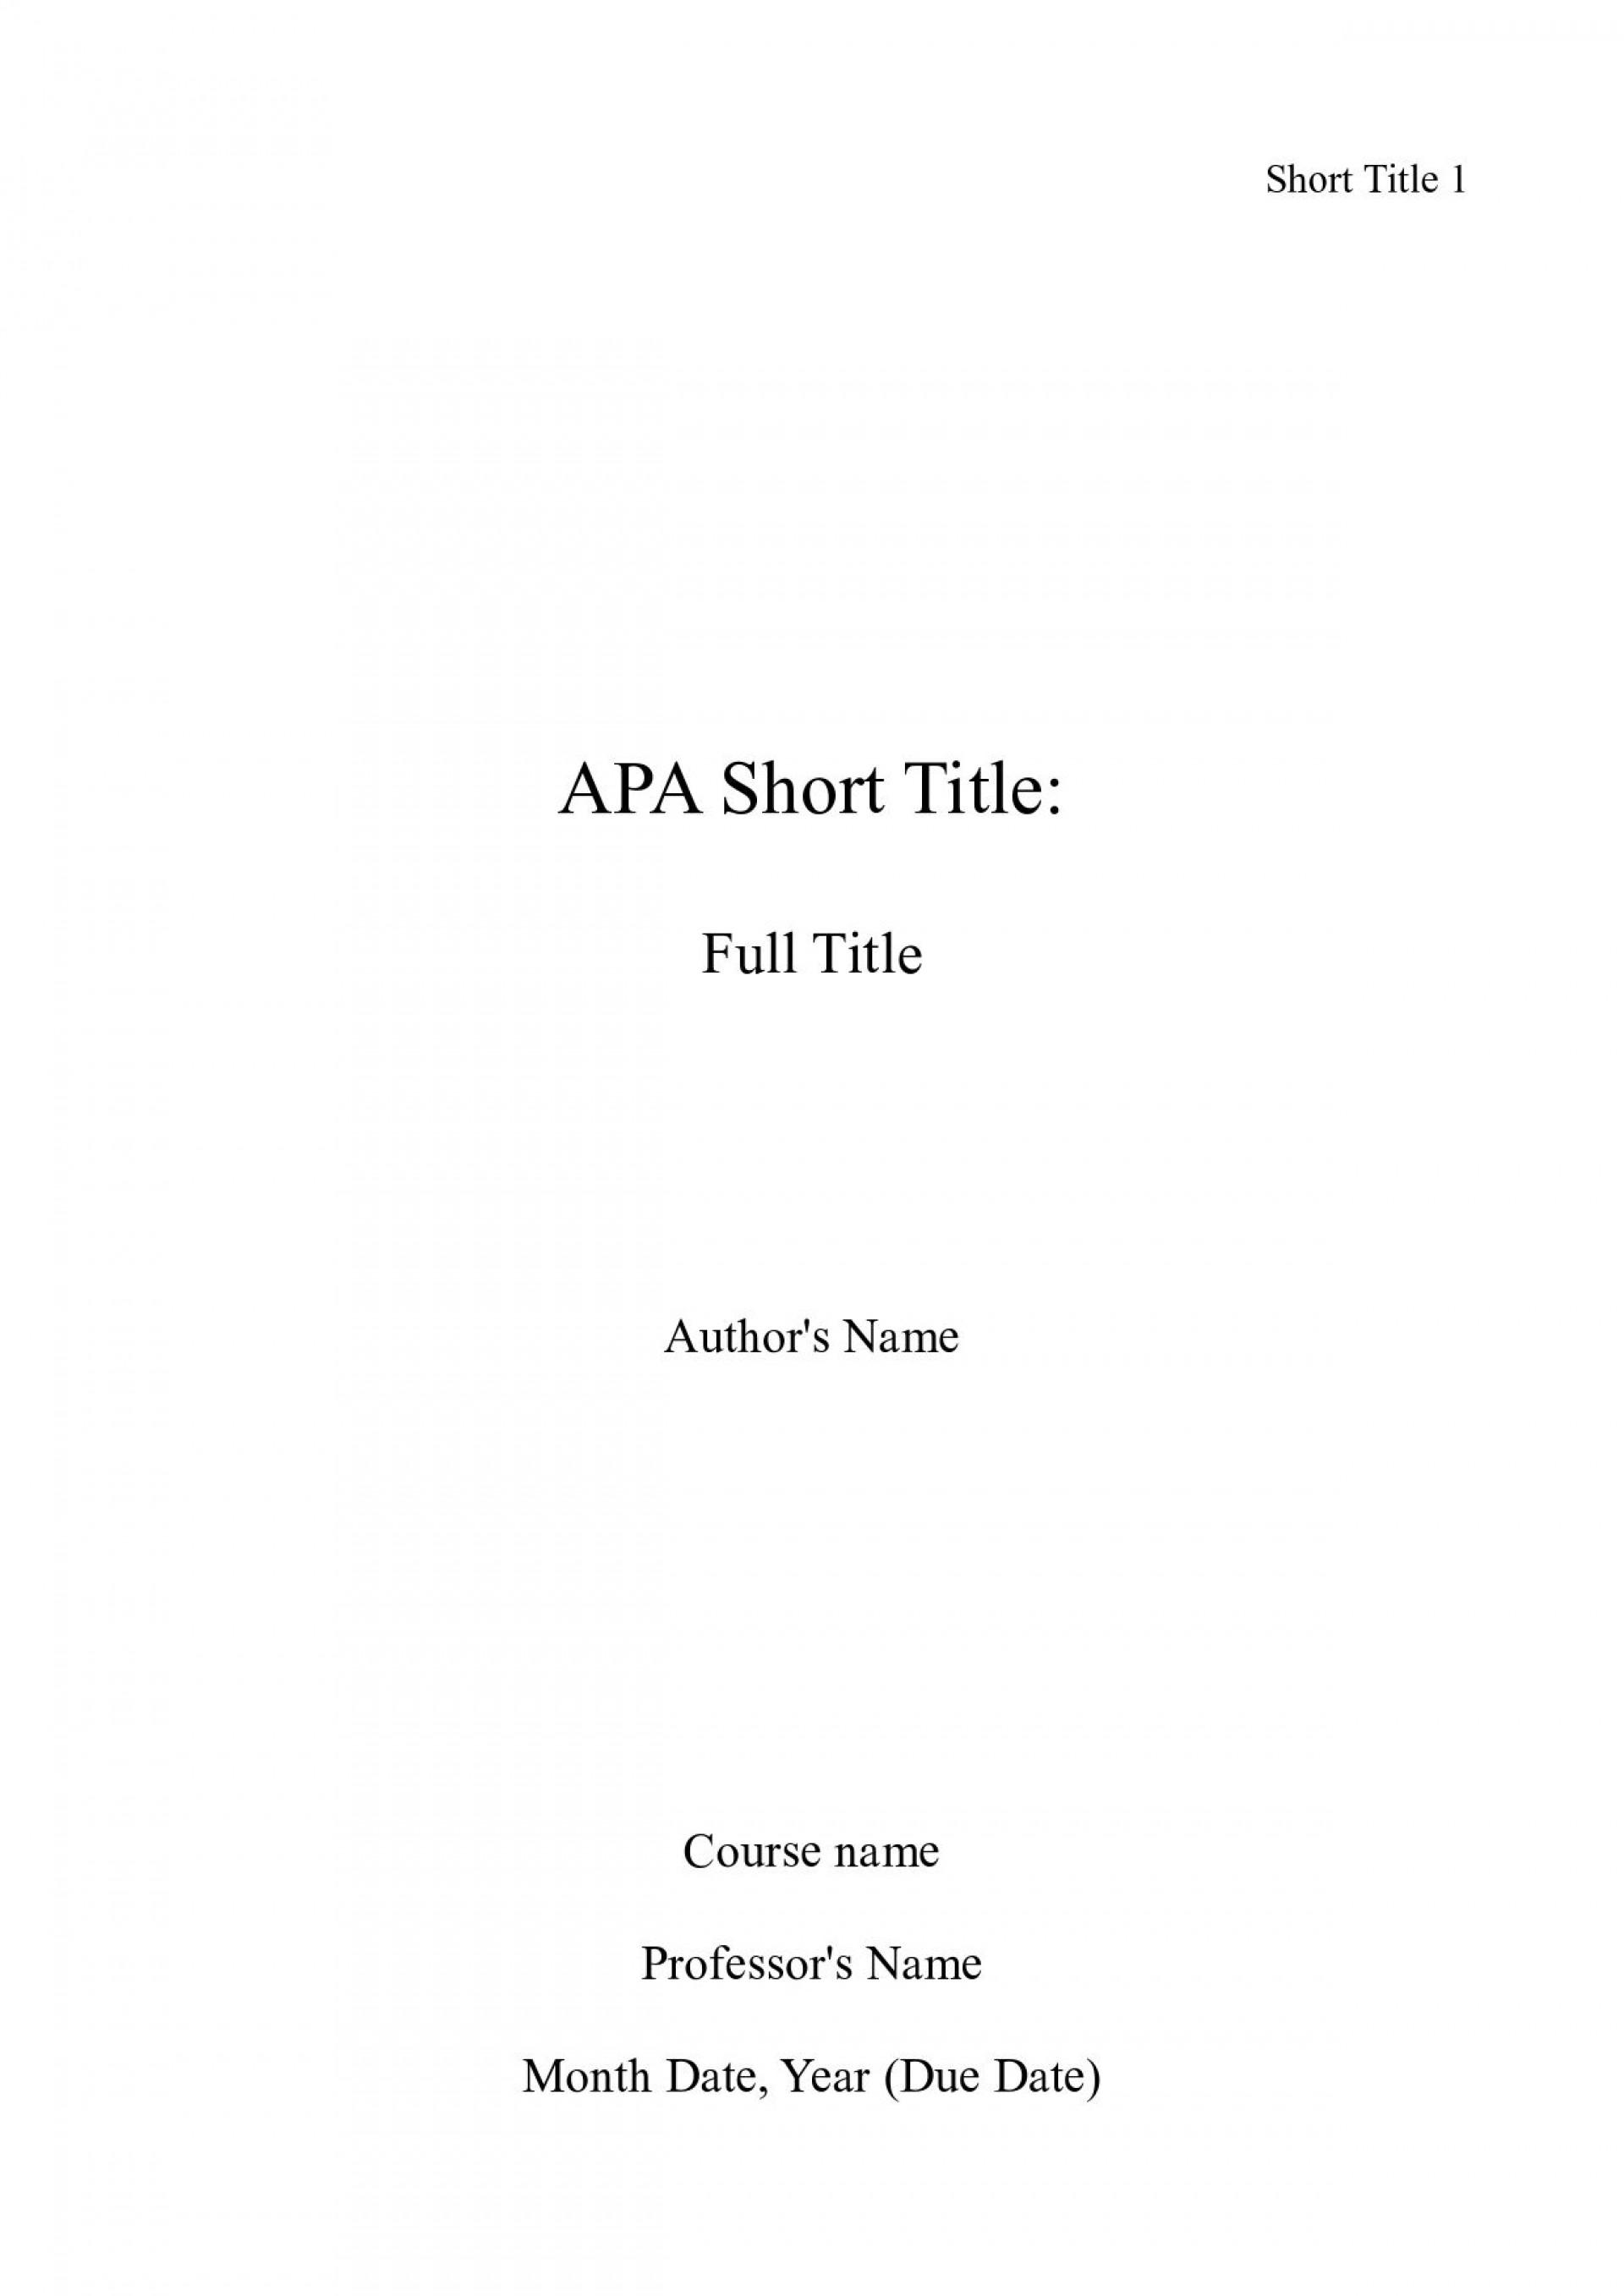 001 Essay Cover Page Apa Example Impressive Correct Title Proper Format 1920